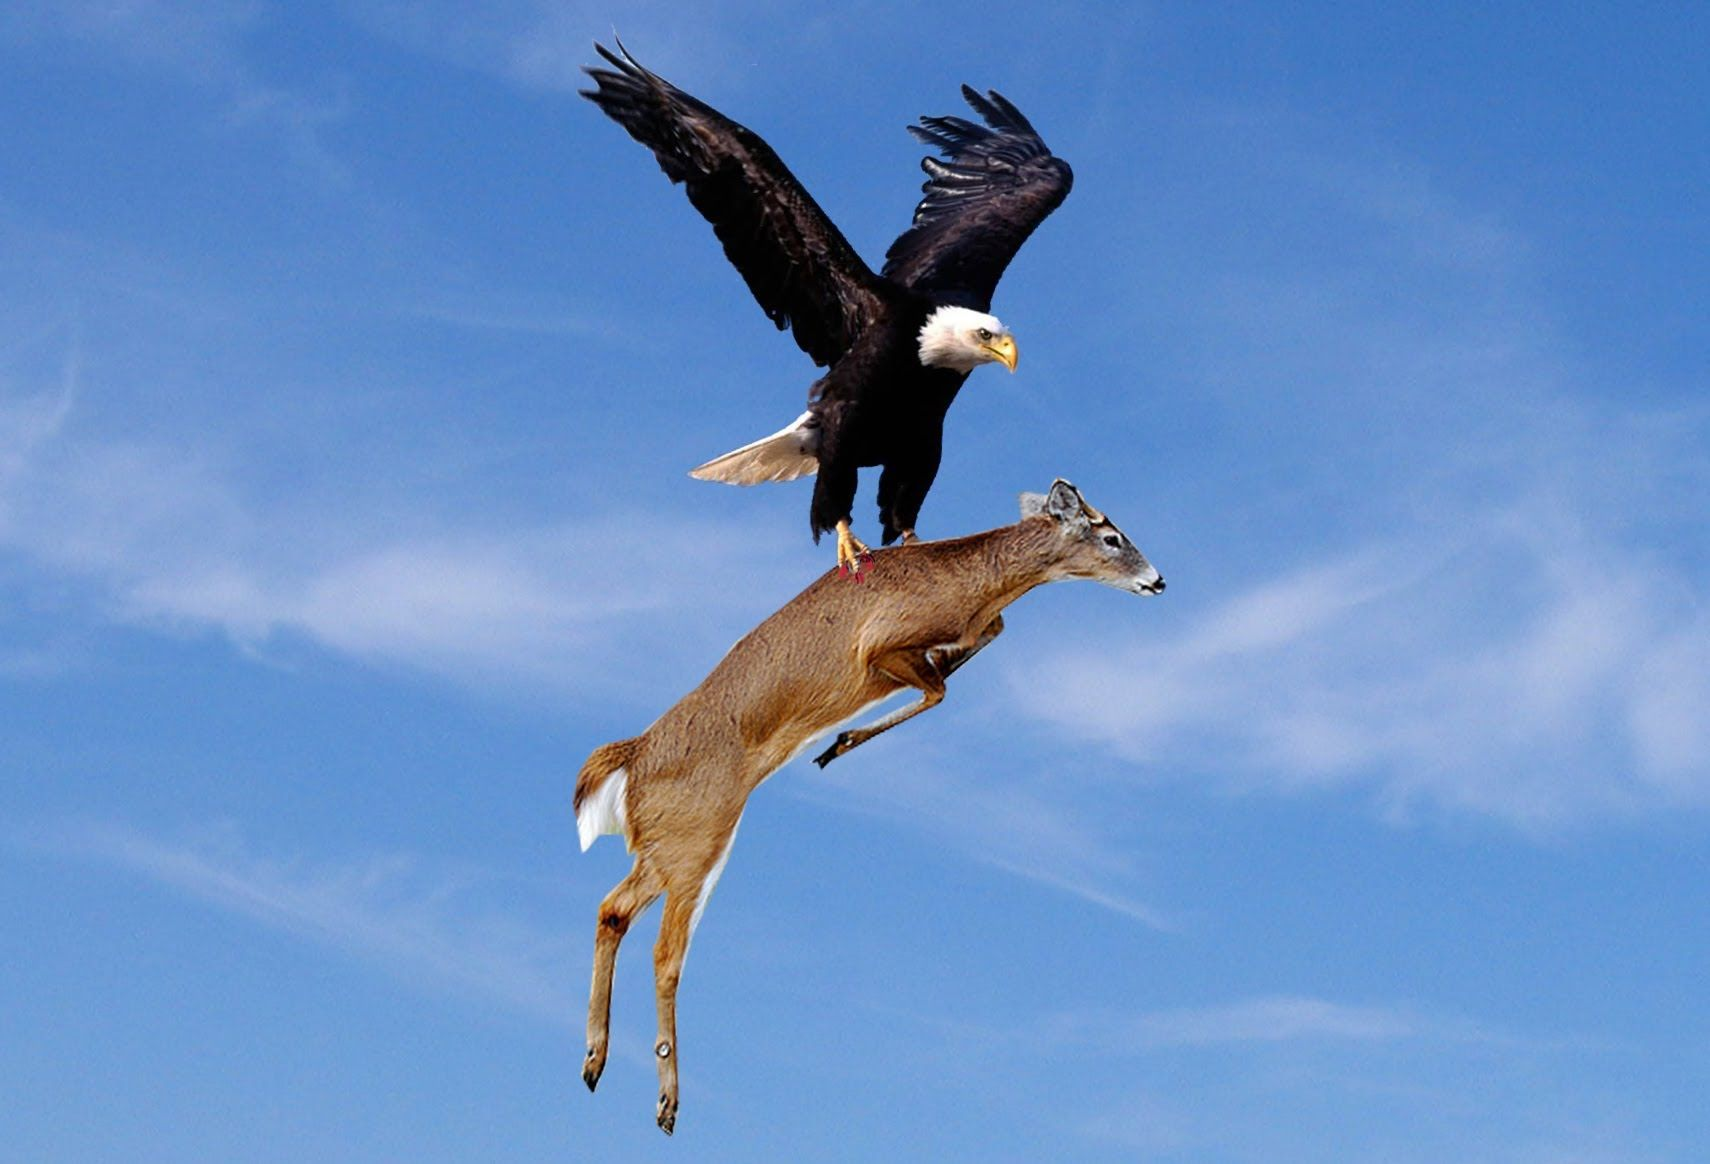 Bald eagle bends examine duckling prey mid, The bald eagle